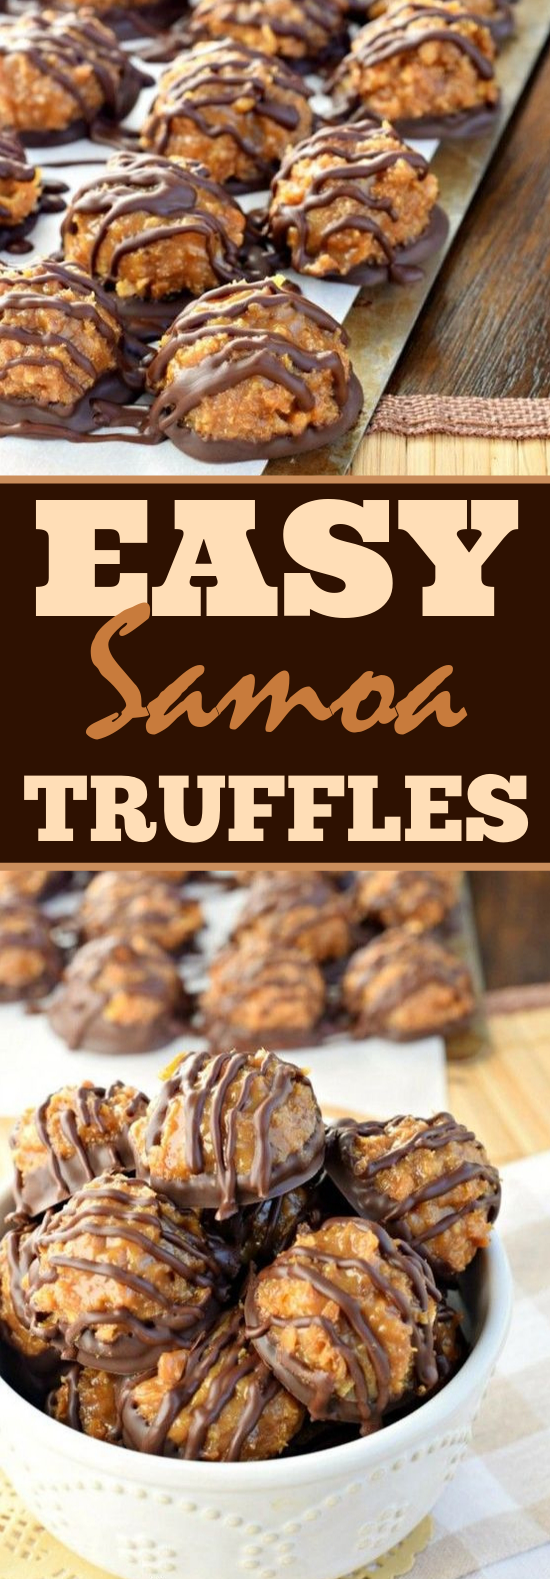 Samoa Truffles #desserts #easy #chocolate #coconut #truffles